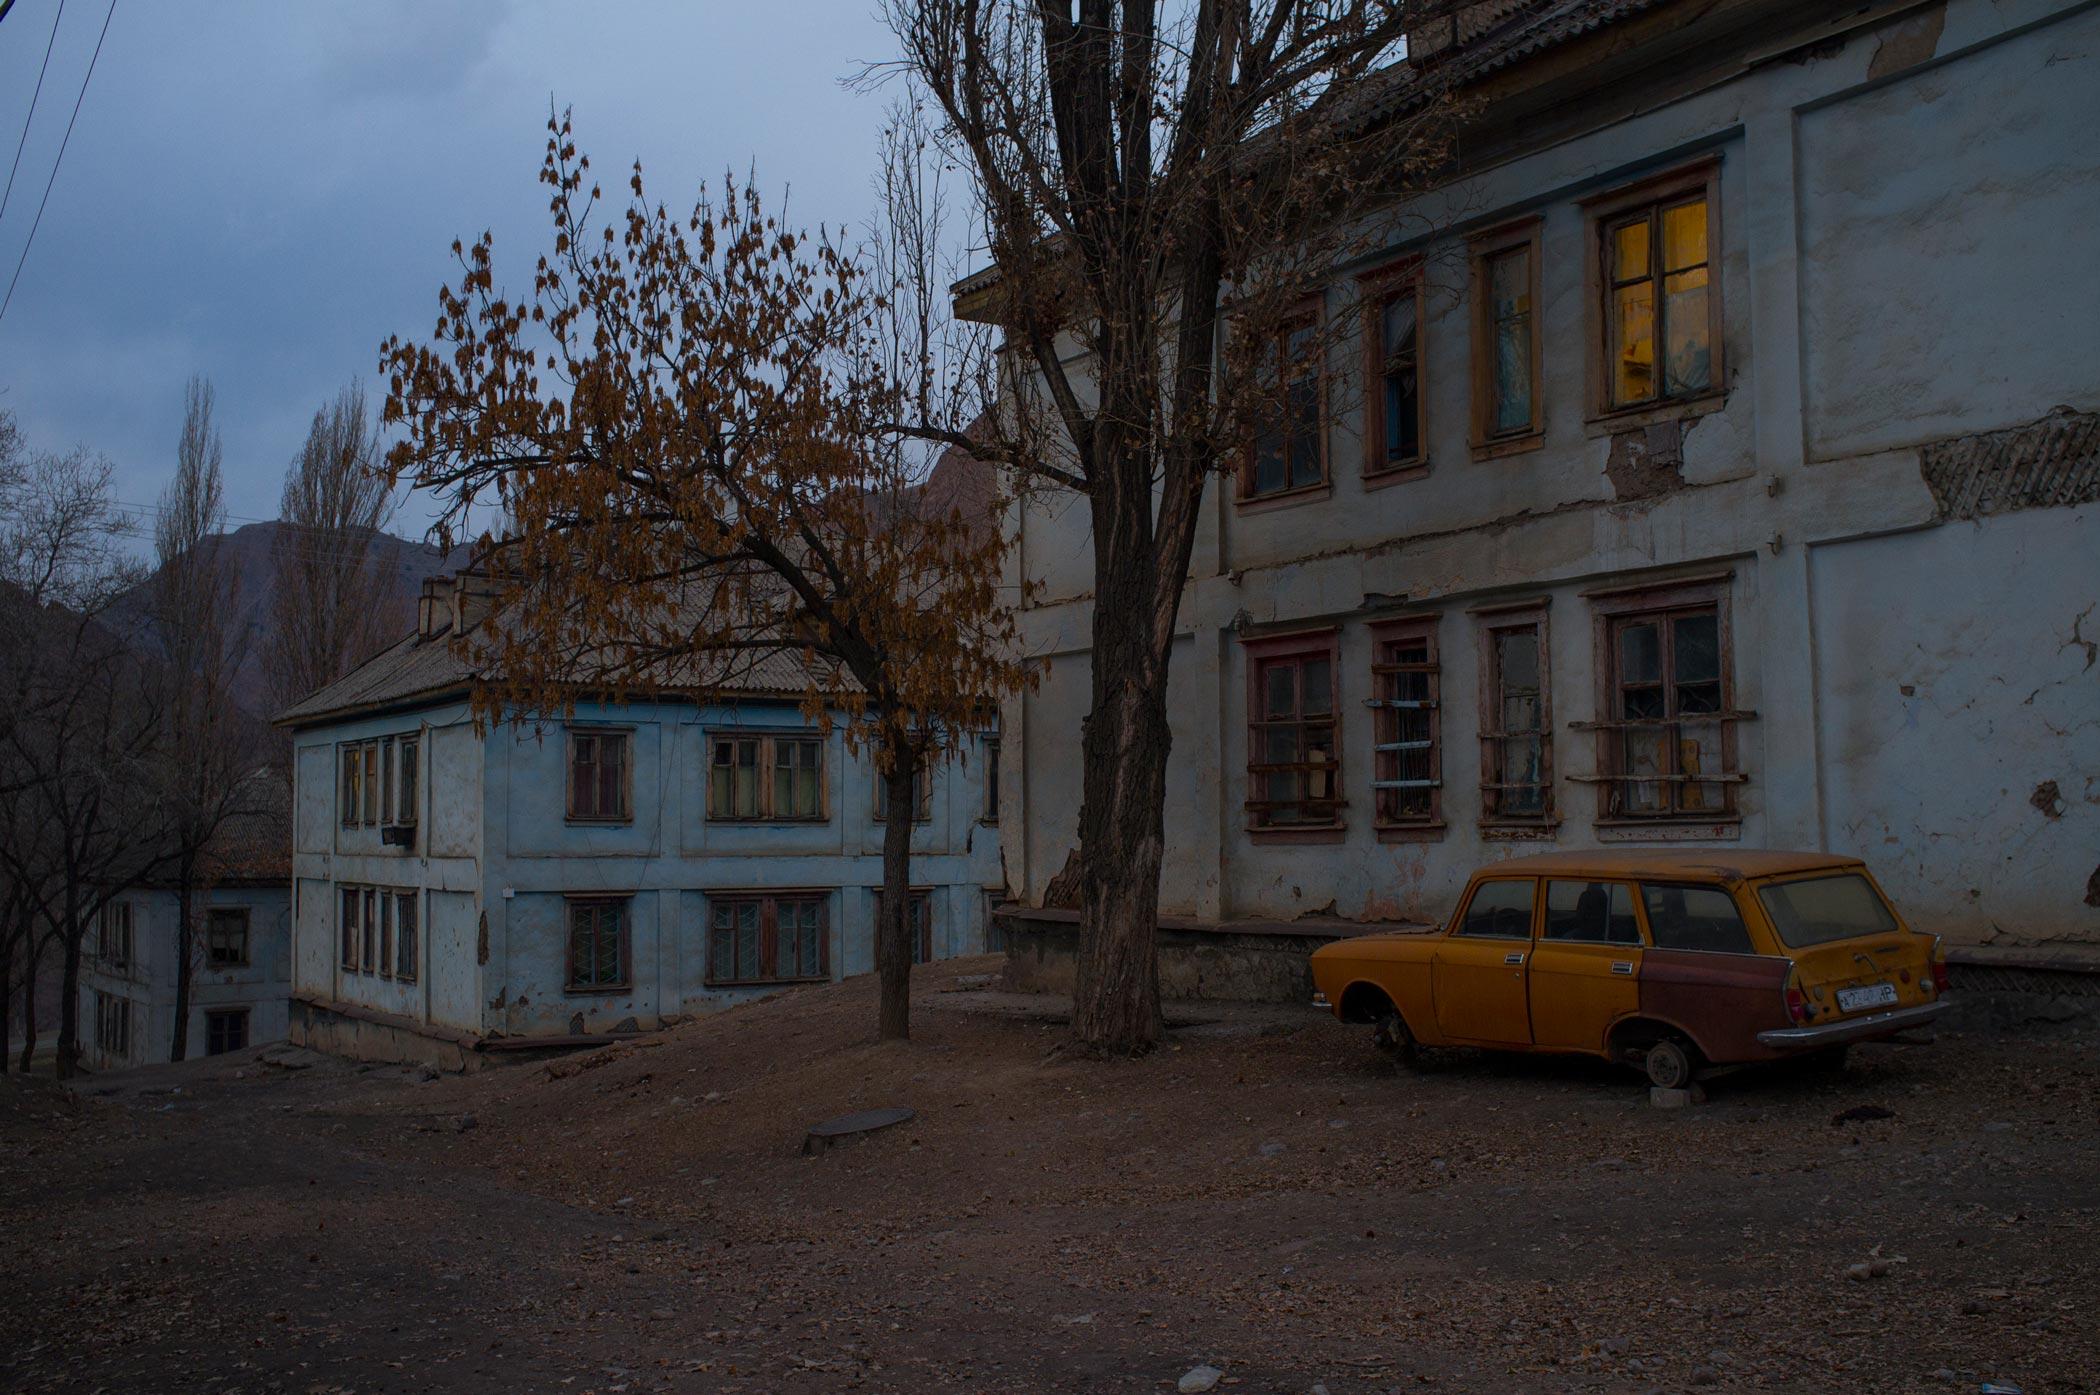 An orange car outside houses in Min Kush, Kyrgyzstan